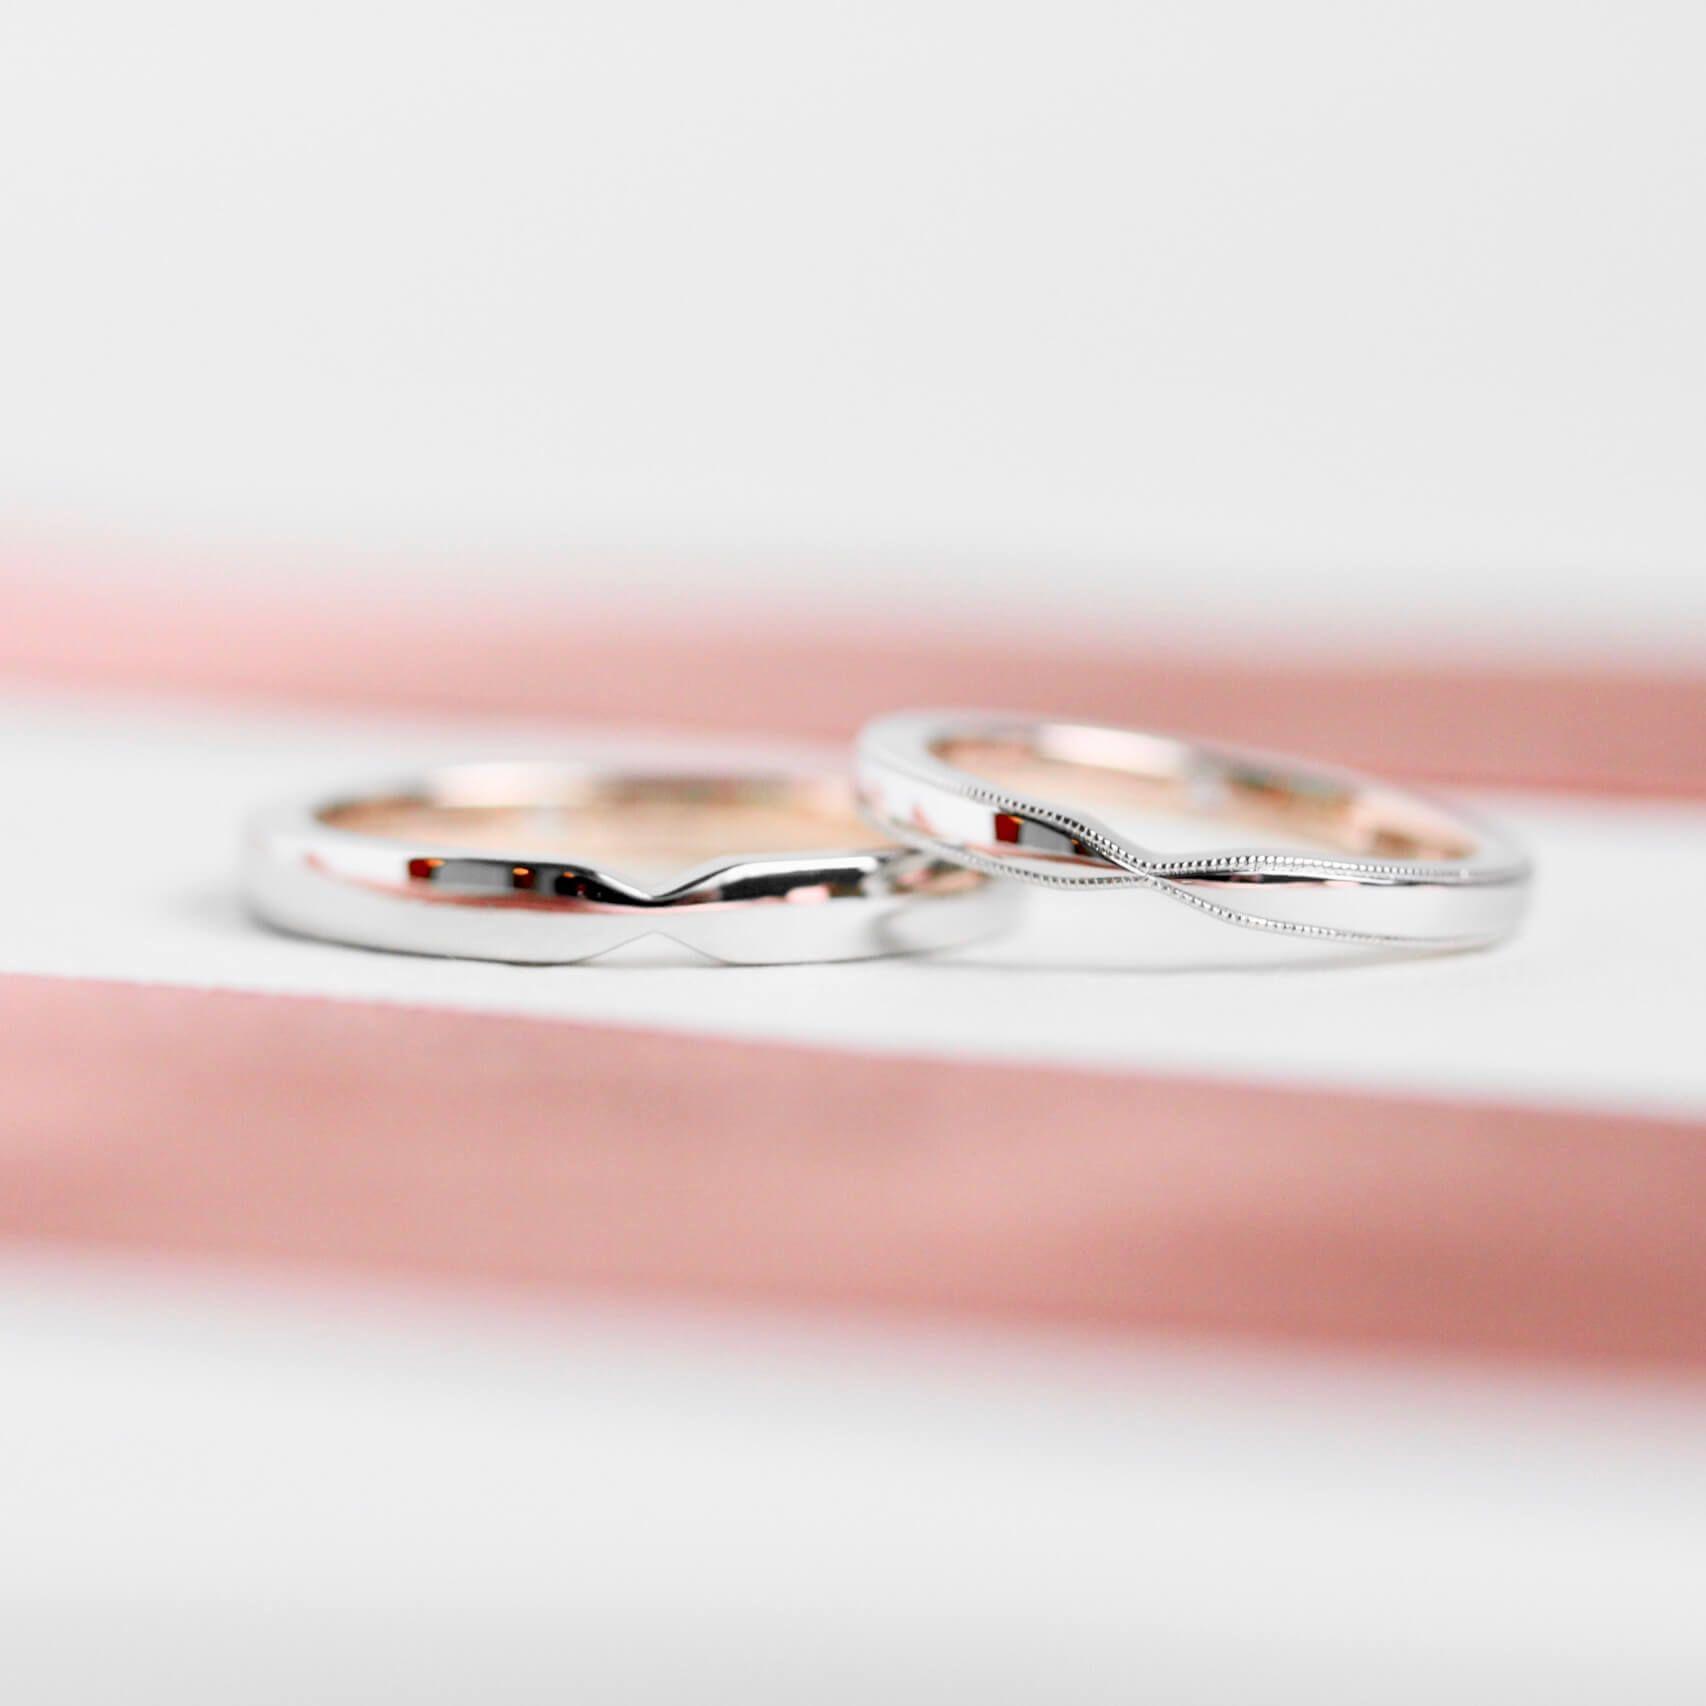 ith リボンのようなフォルムをした二色の結婚指輪 結婚指輪 結婚指輪 オーダーメイド 指輪